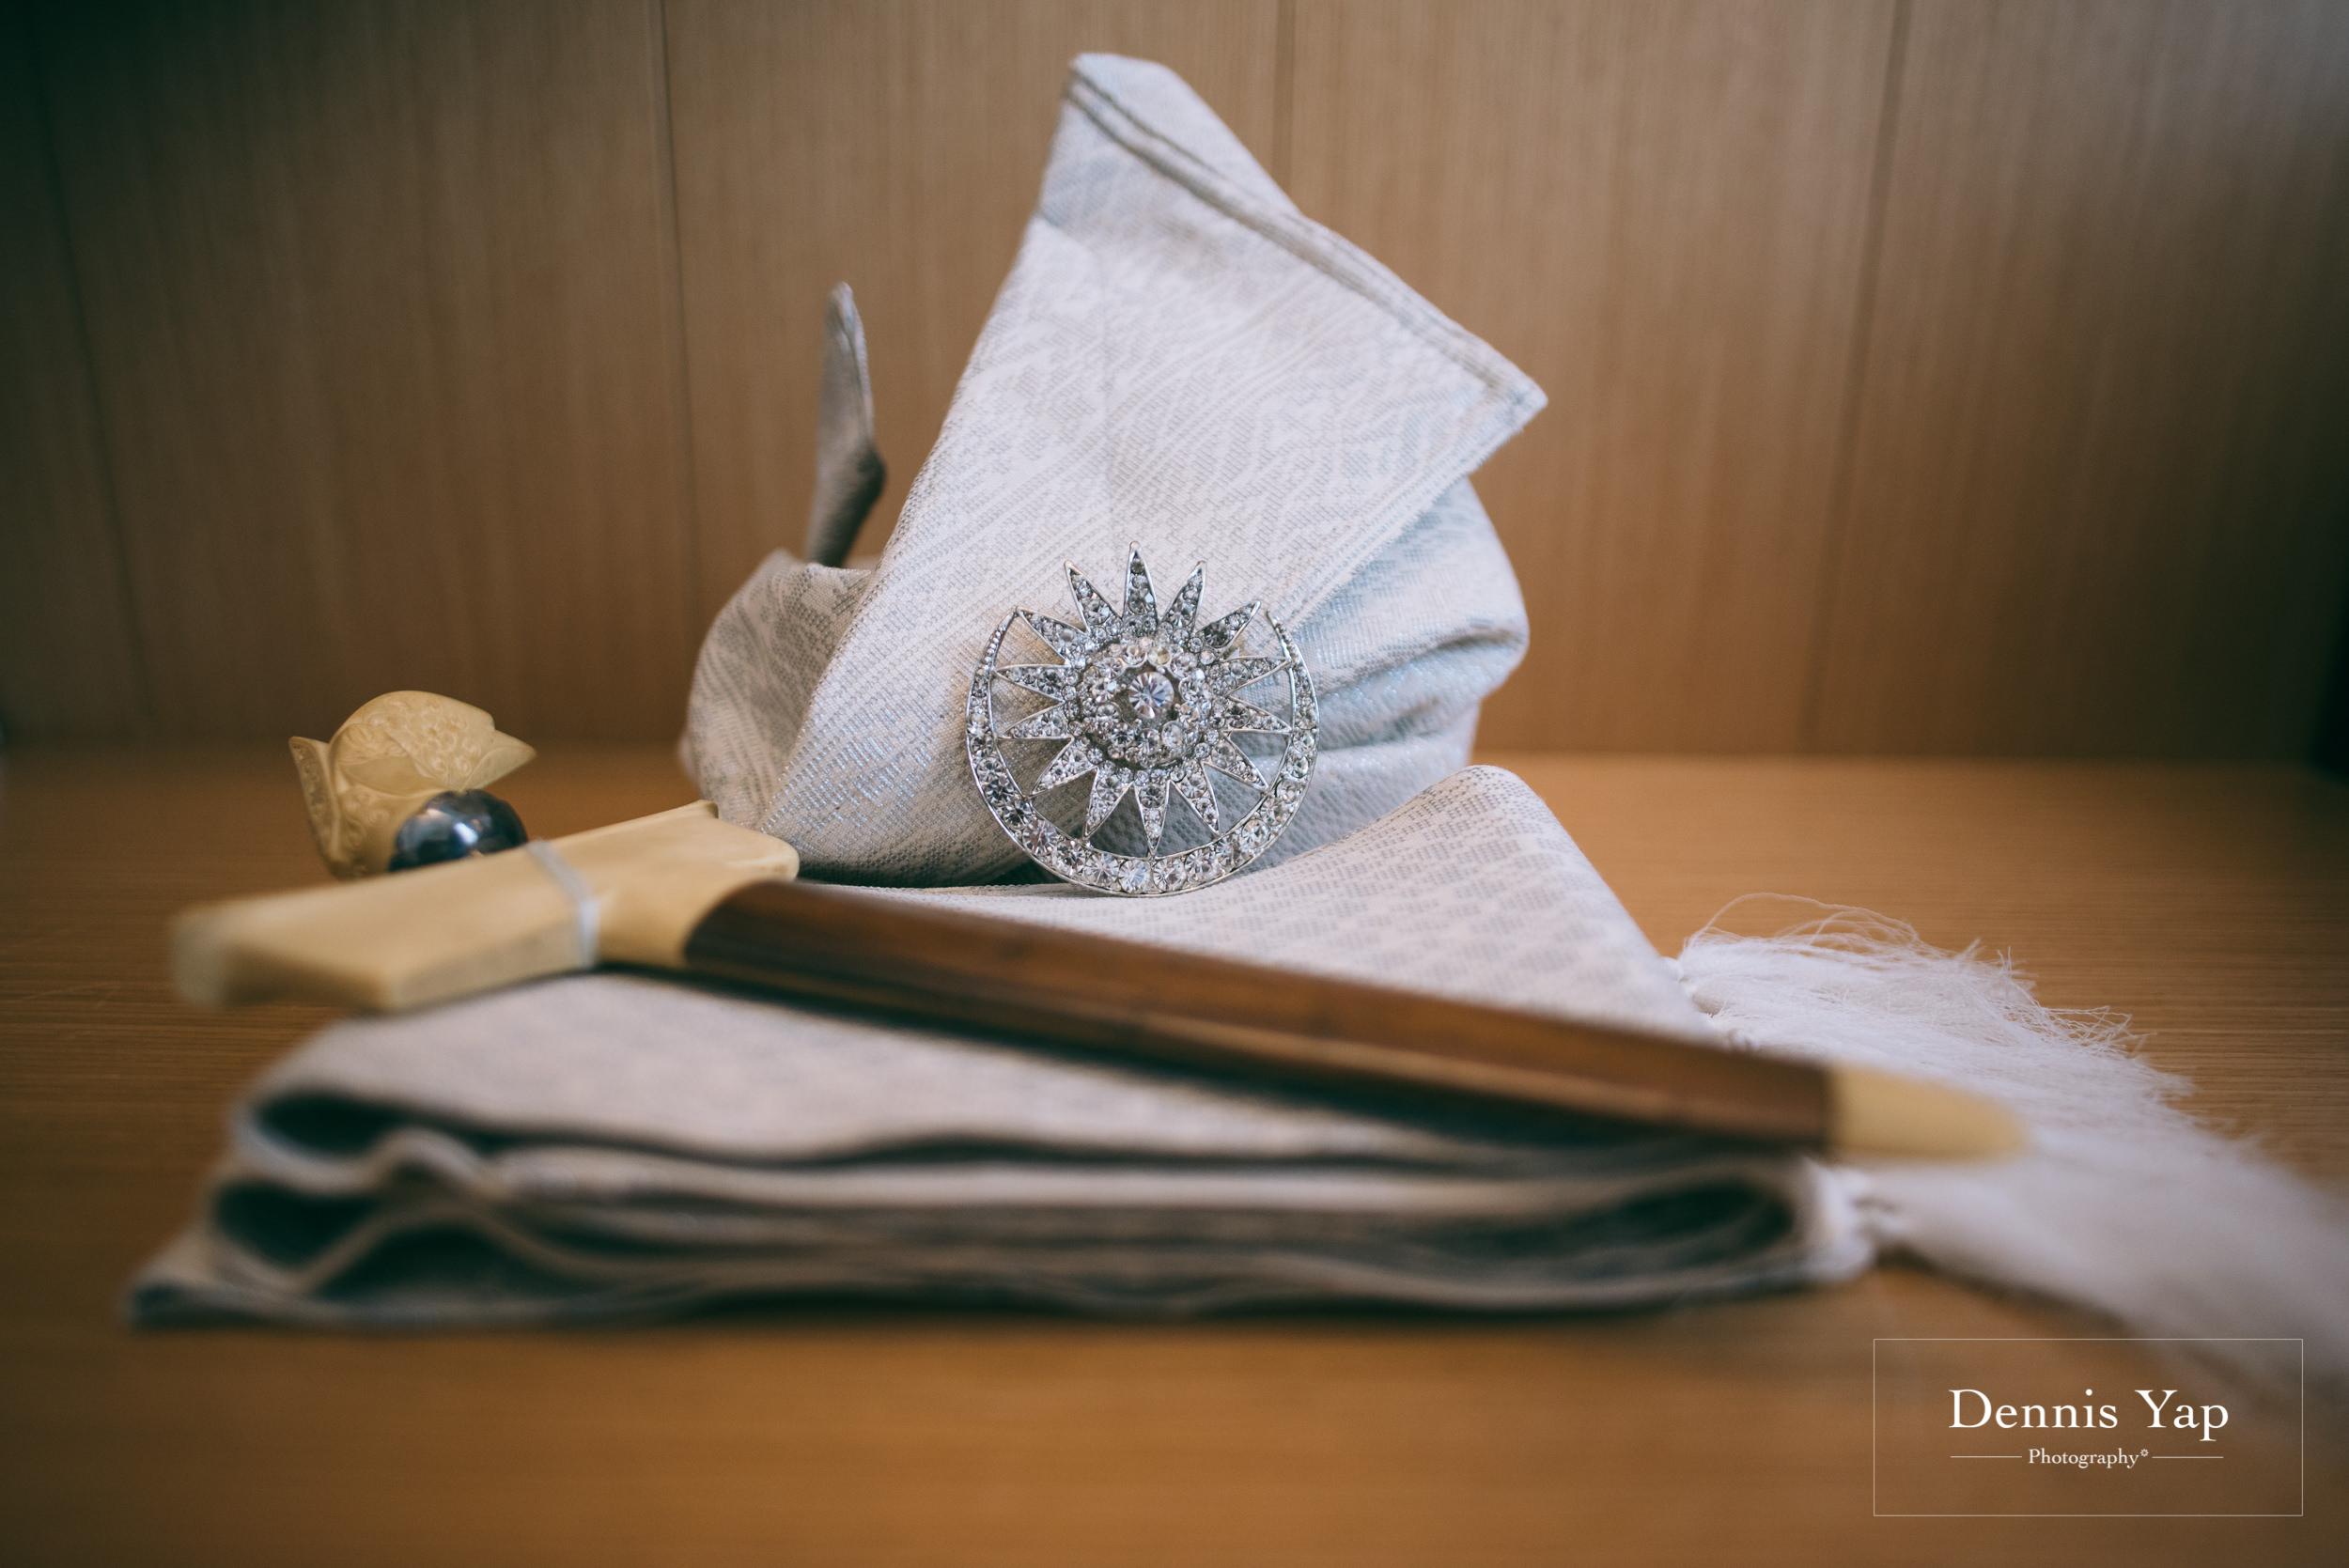 zarif hanalili malay wedding blessing ceremony dennis yap photography-4.jpg